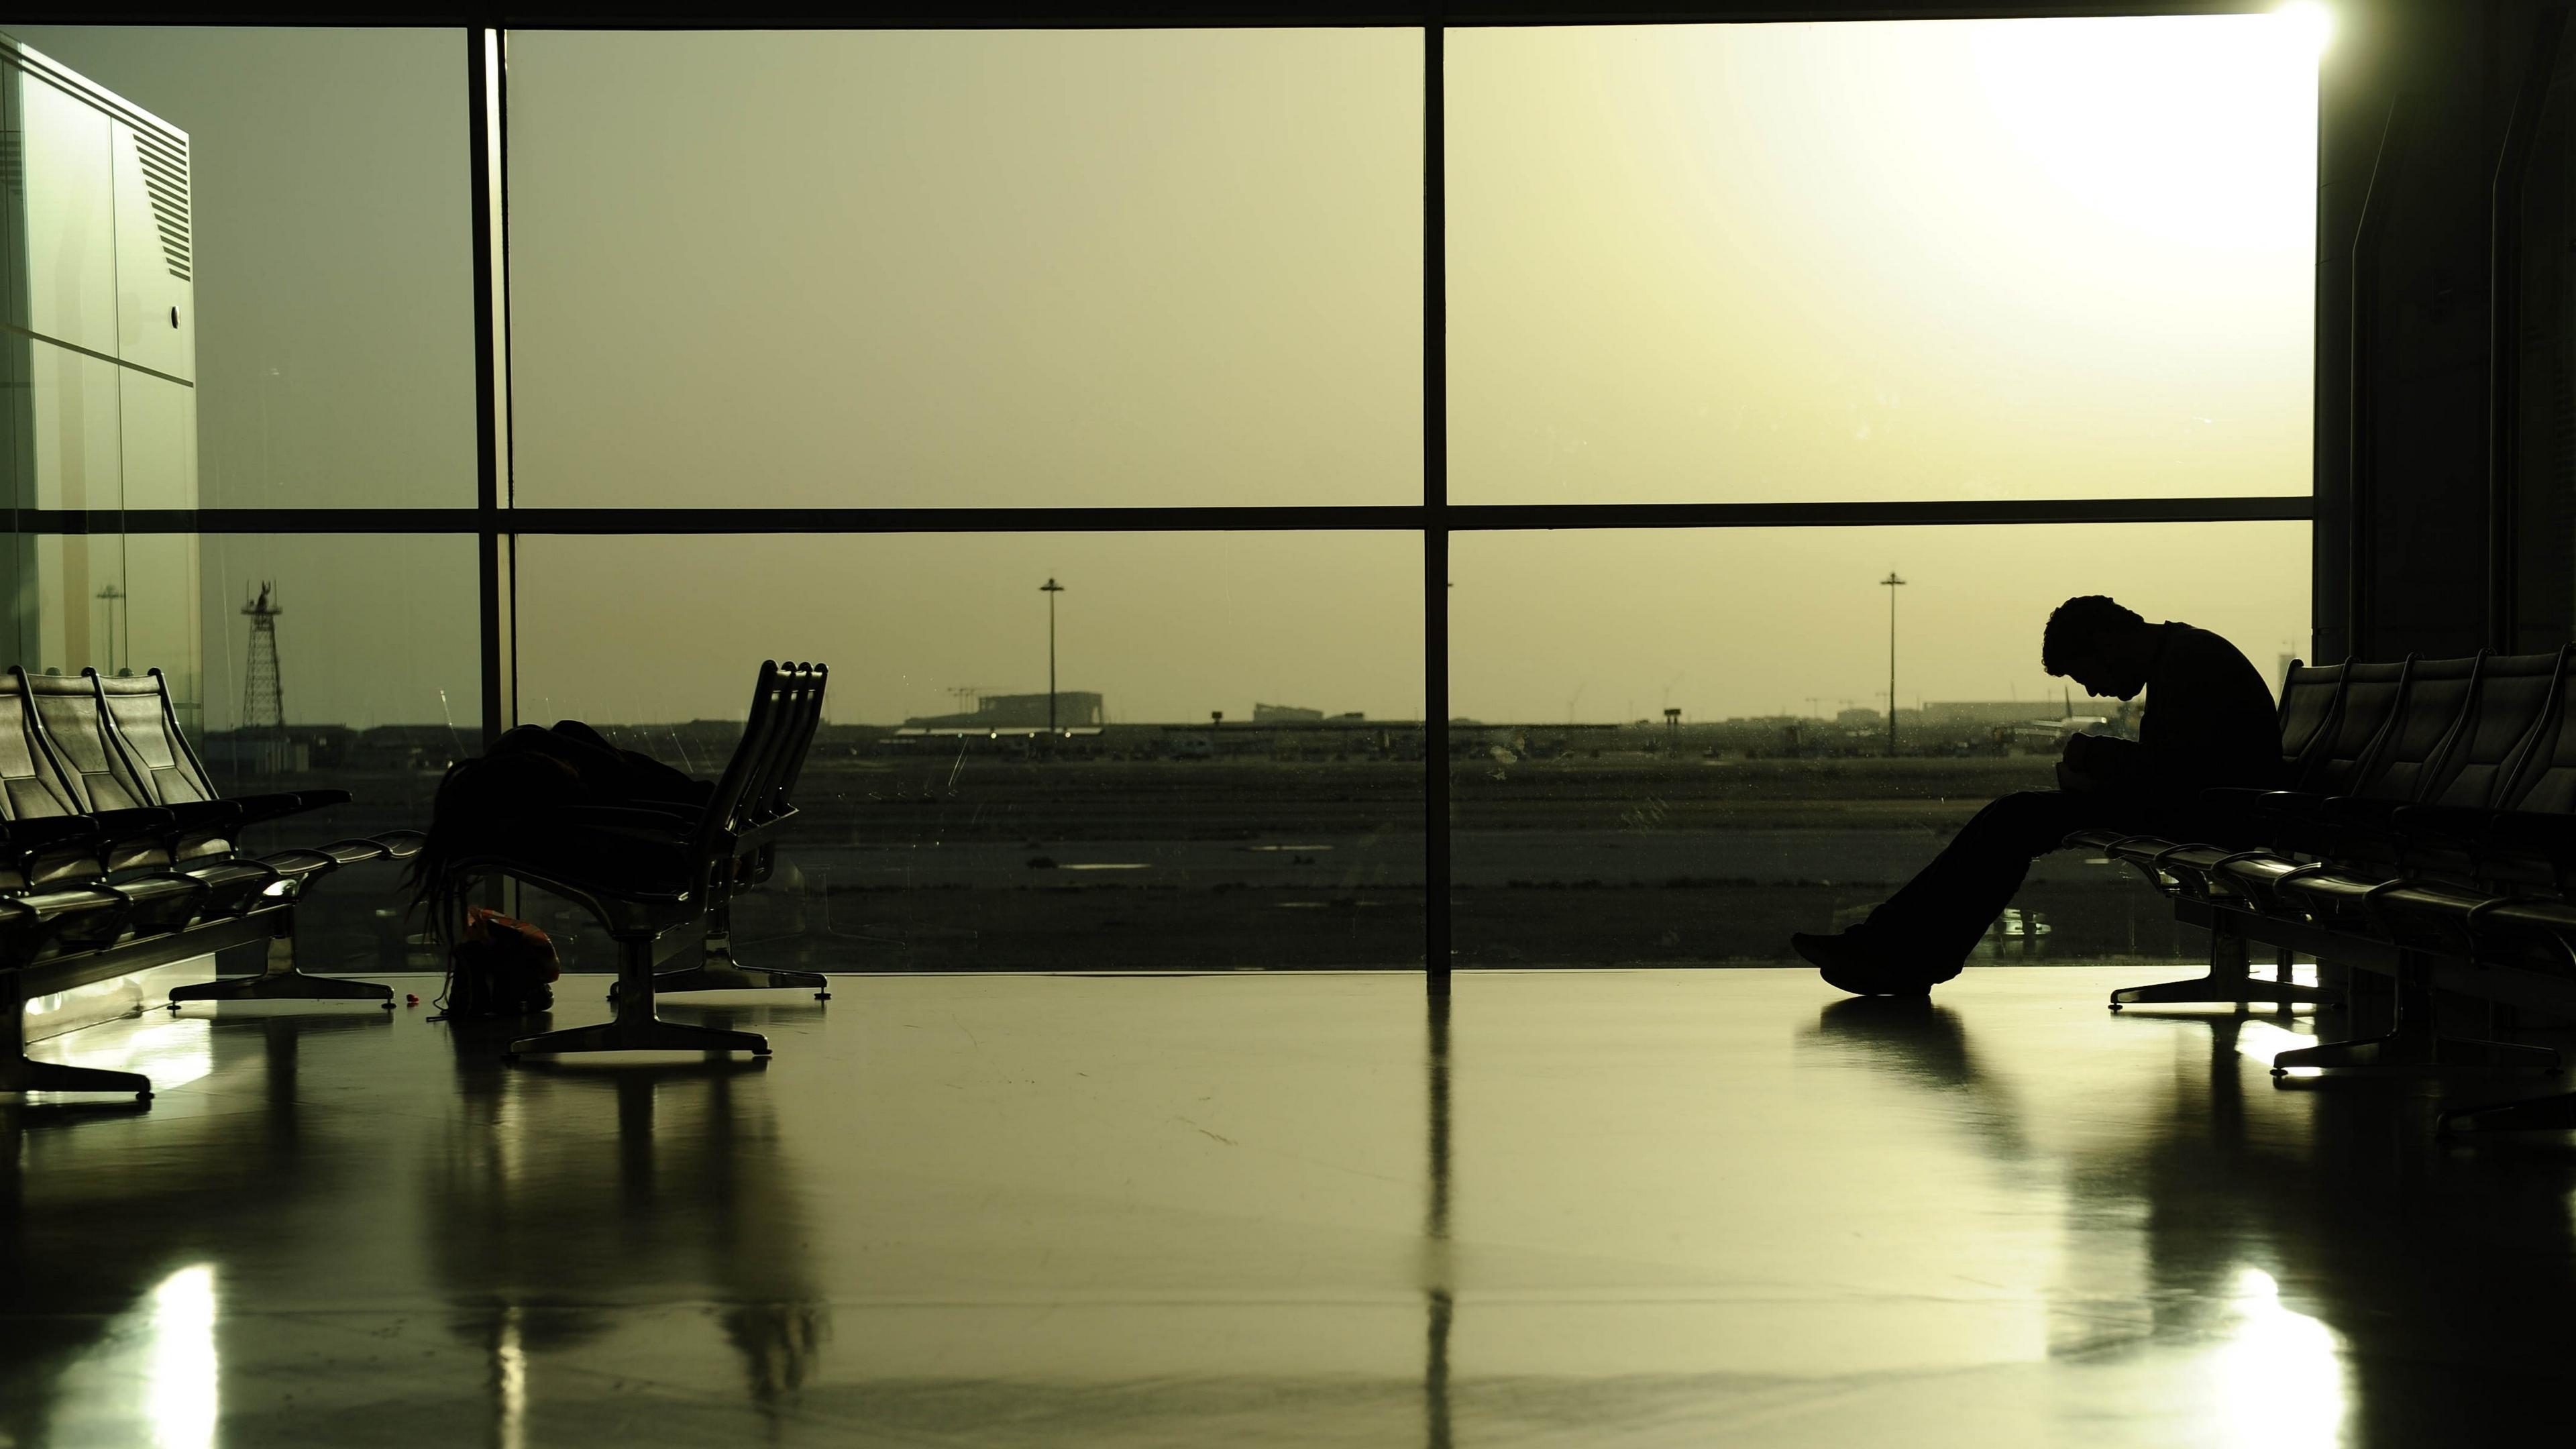 airport waiting man 4k 1540575297 - airport, waiting, man 4k - Waiting, Man, airport